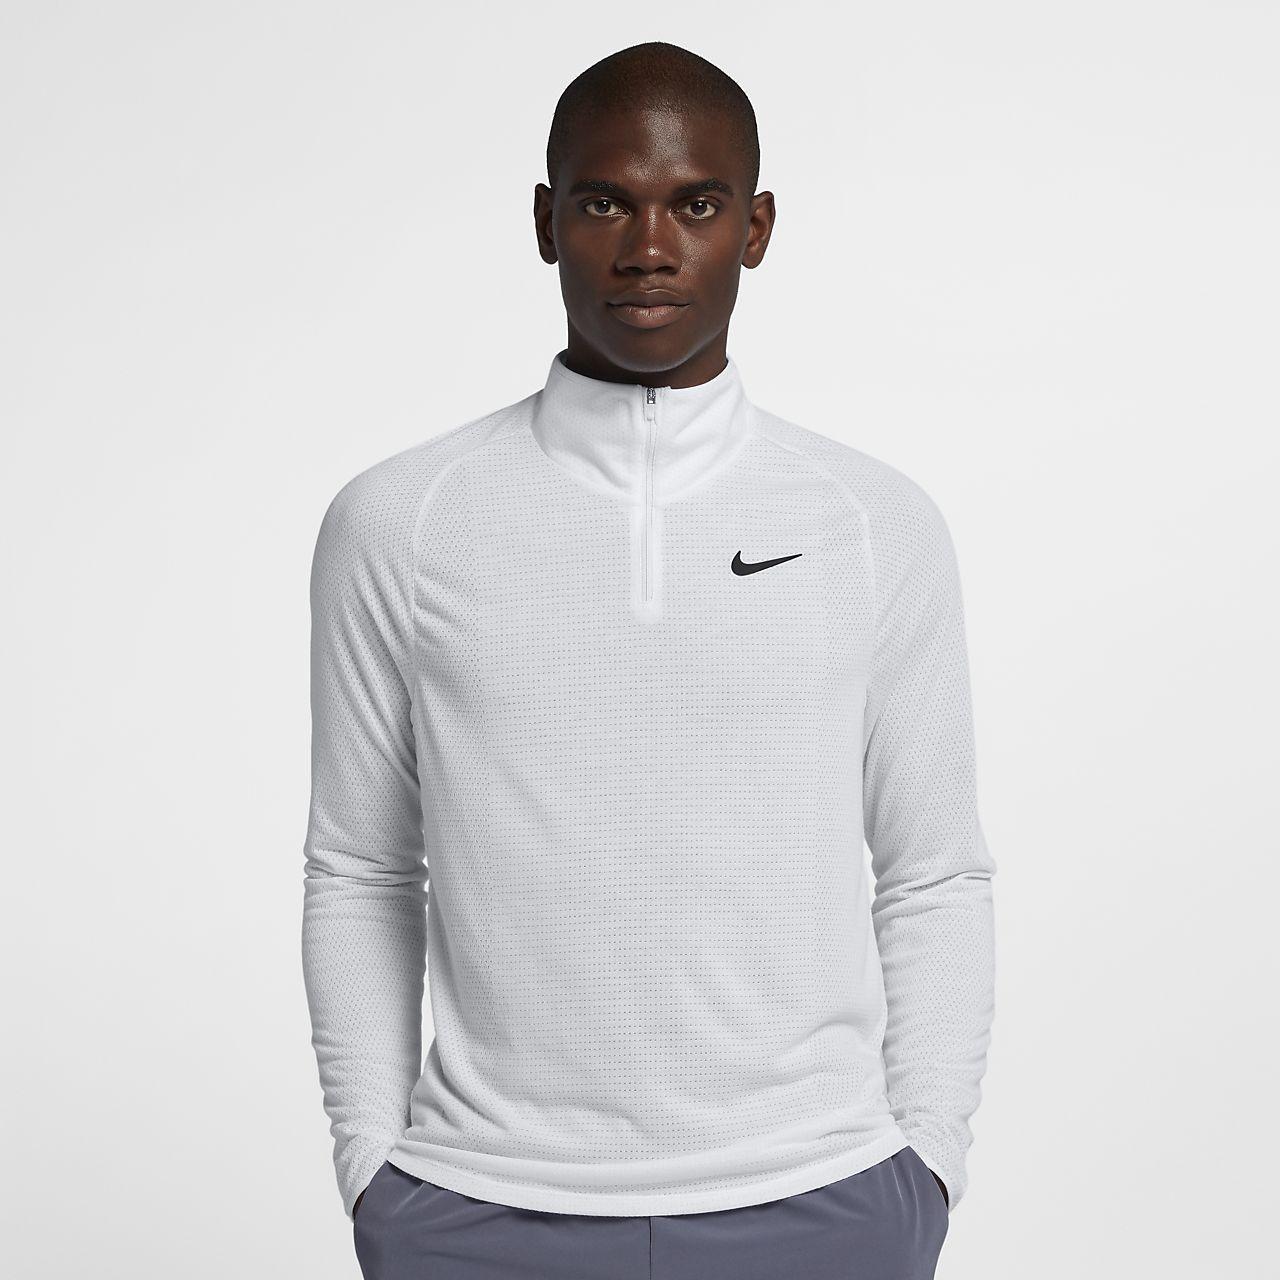 Camisola de ténis com fecho até meio NikeCourt Dri-FIT Challenger para homem